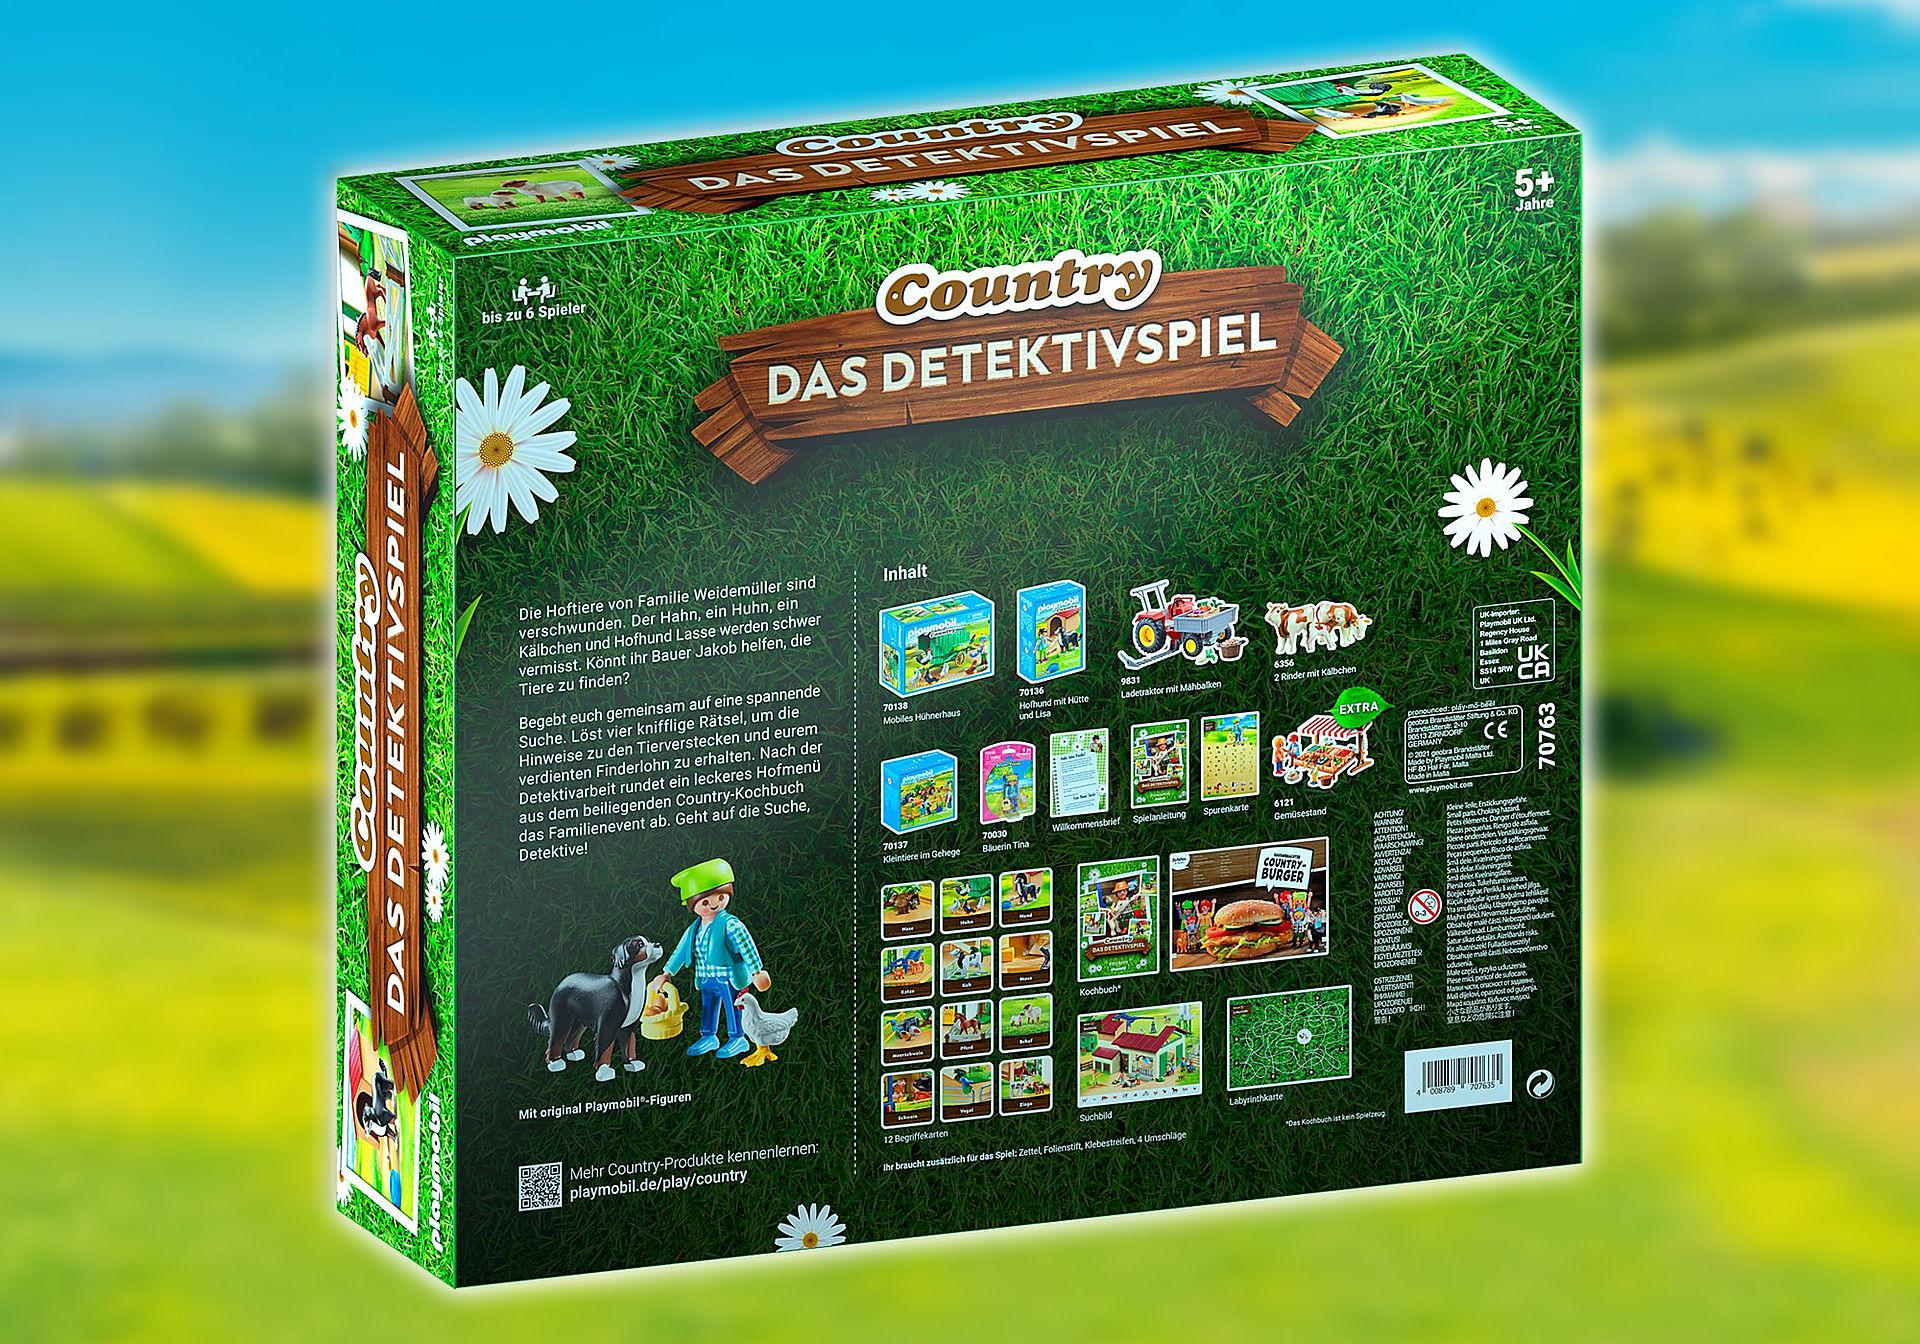 70763 PLAYMOBIL®Box: COUNTRY Das Detektivspiel Das Familienevent zoom image2